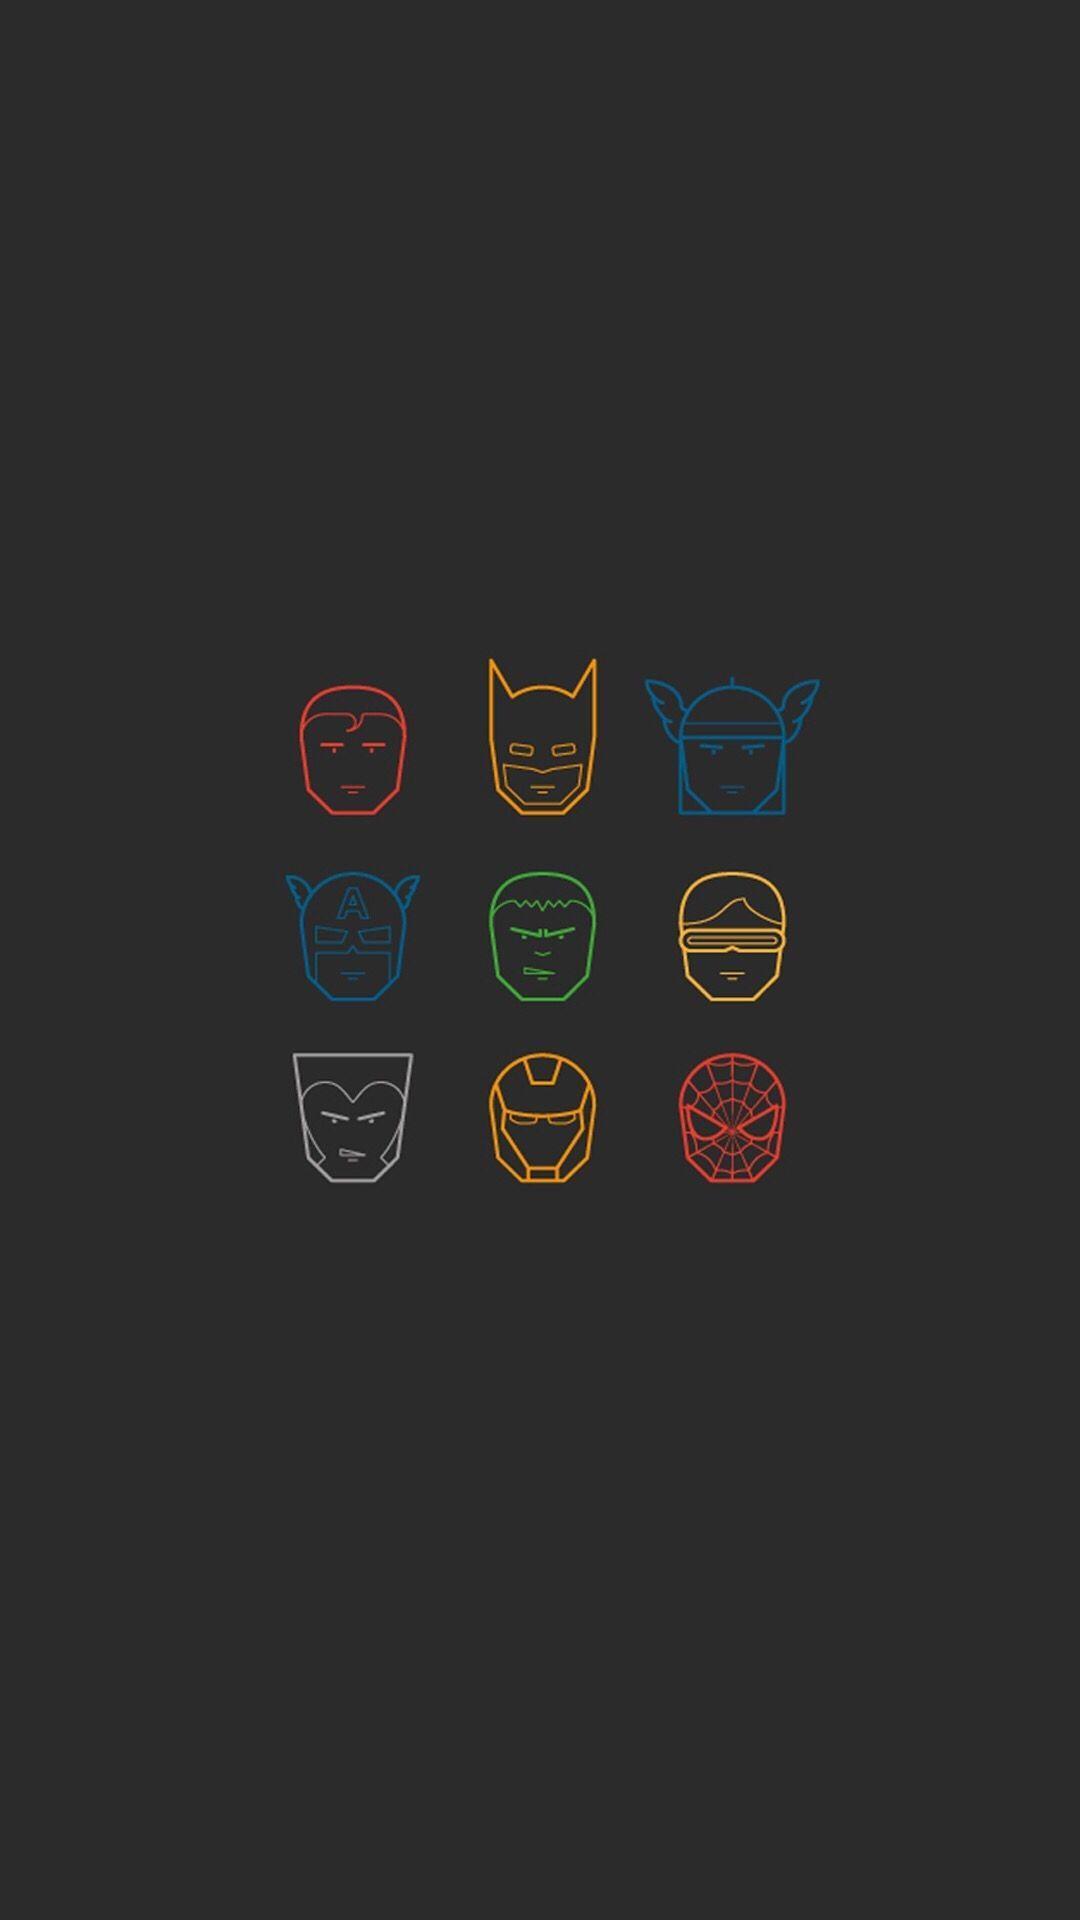 Avengers Minimalist Phone Wallpapers Top Free Avengers Minimalist Phone Backgrounds Wallpaperaccess